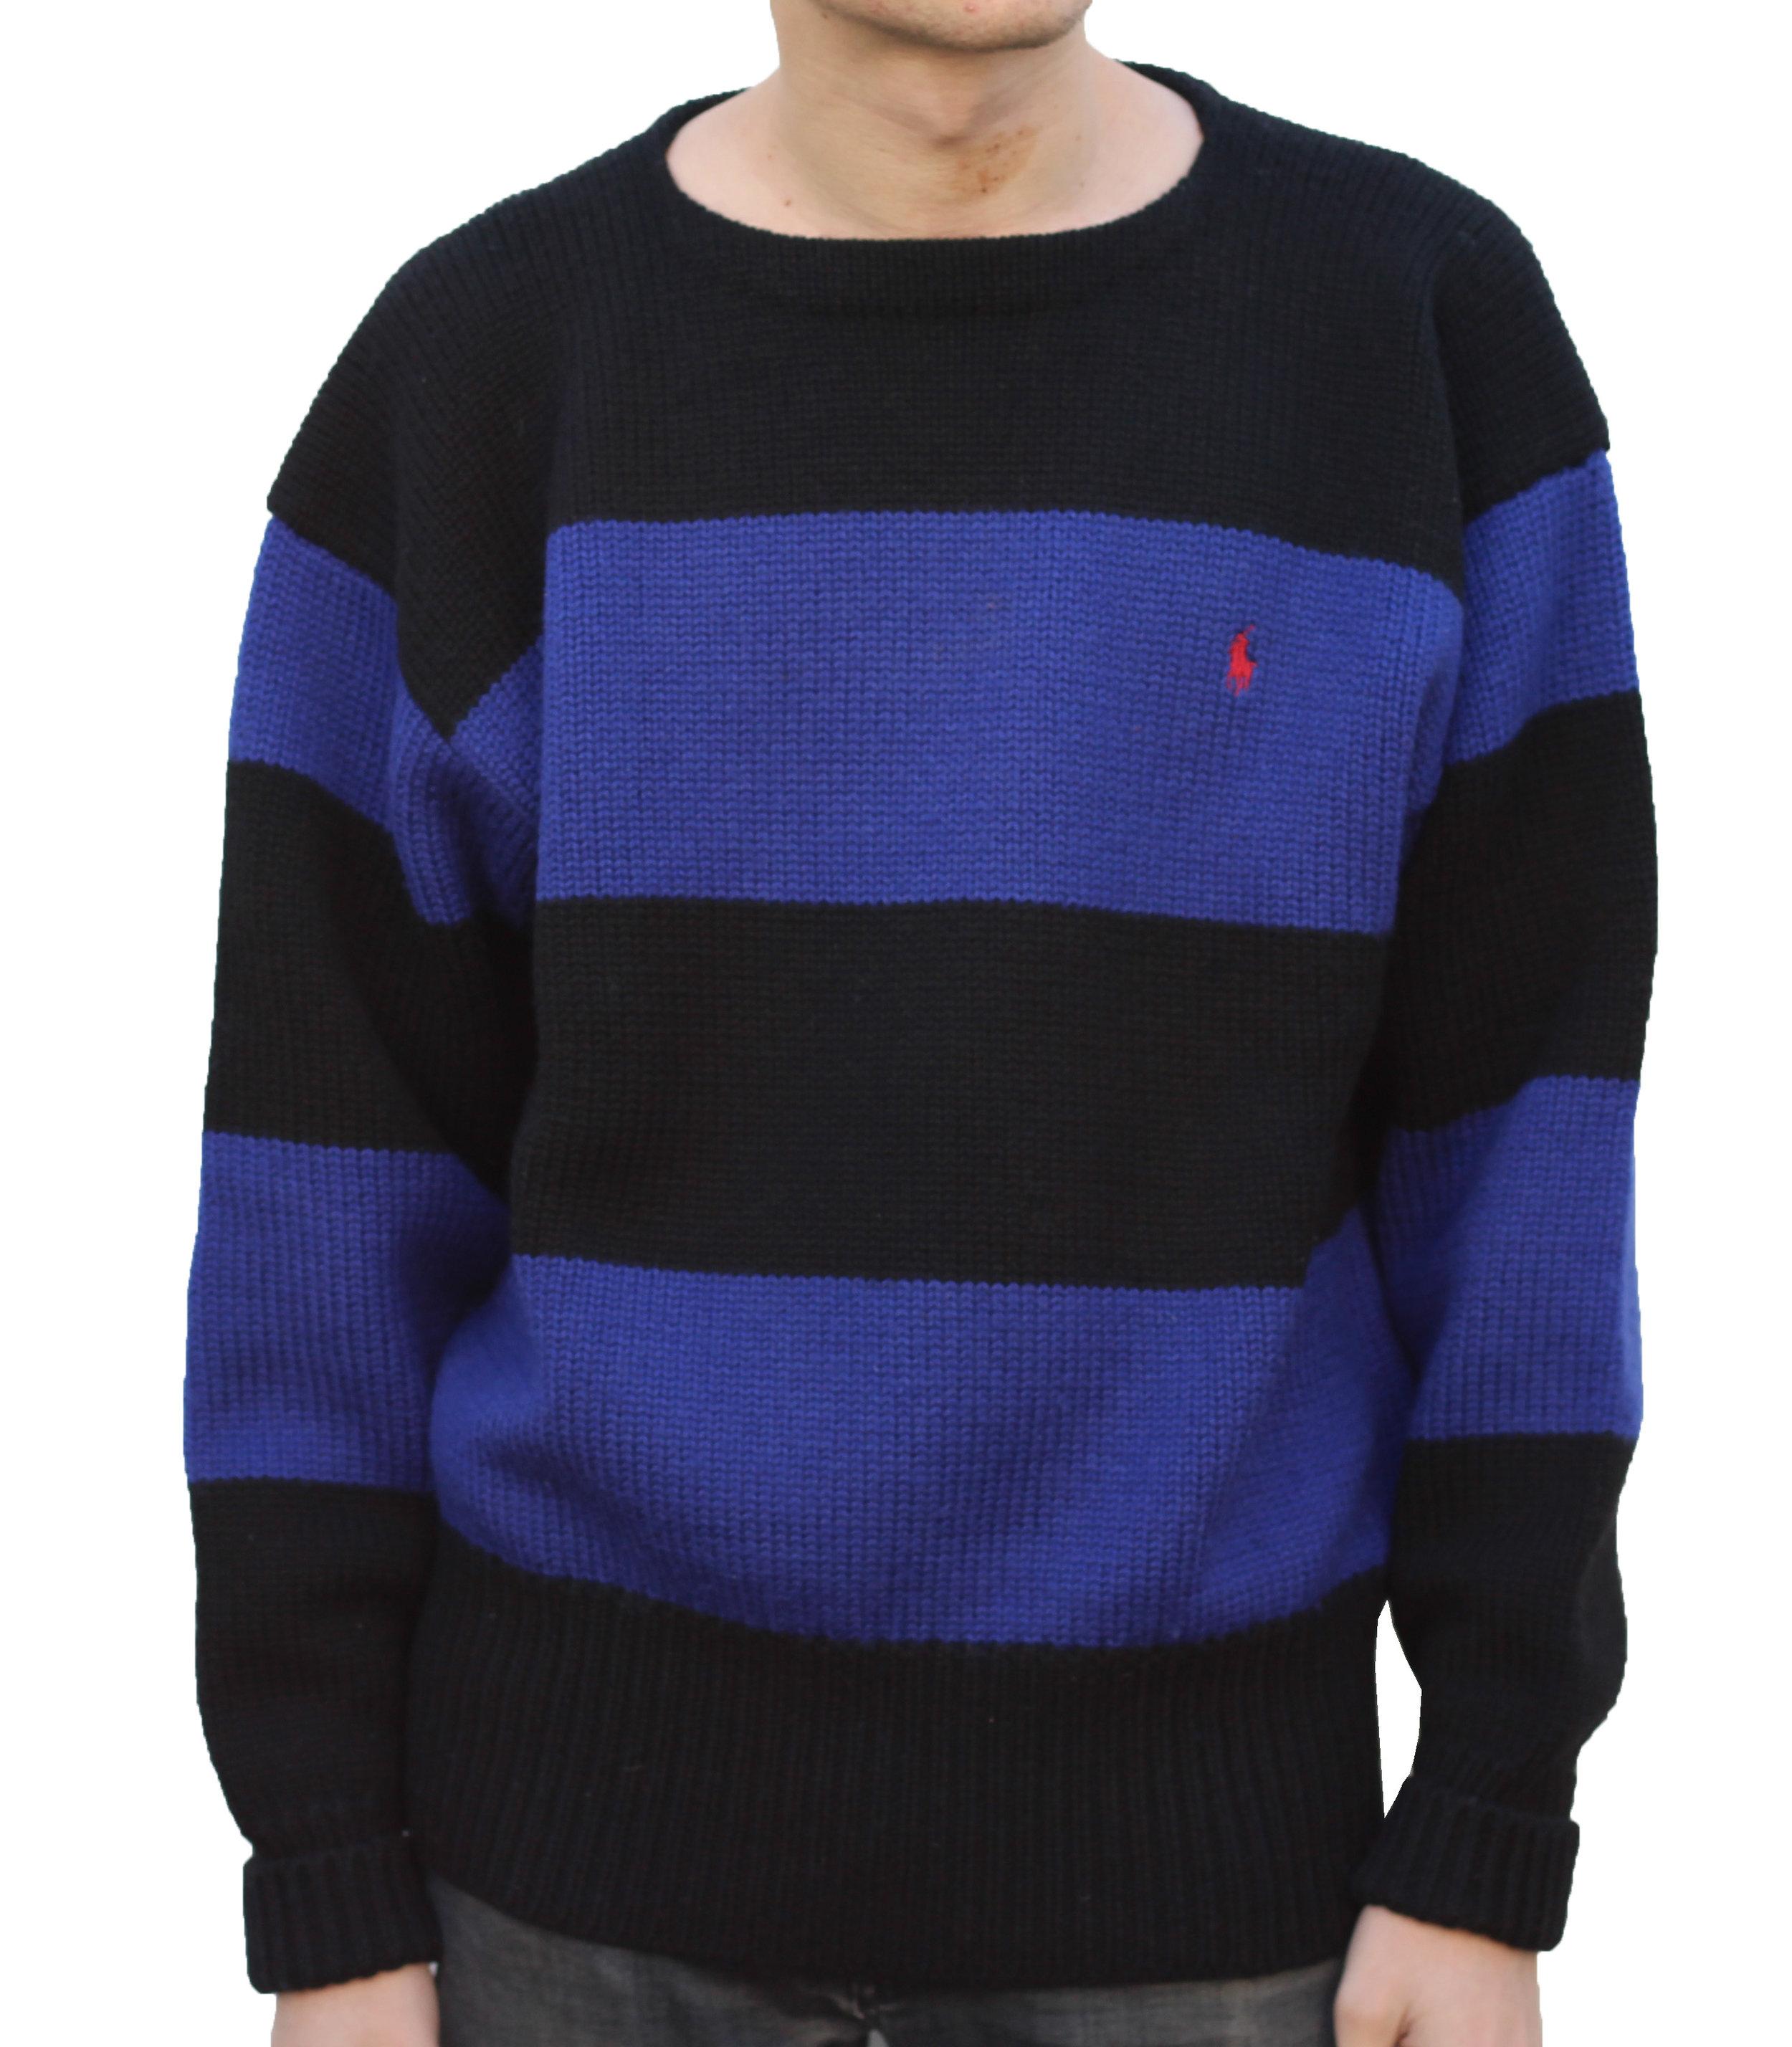 Vintage Polo Ralph Lauren Blue / Black Striped Wool Sweater (Size L)